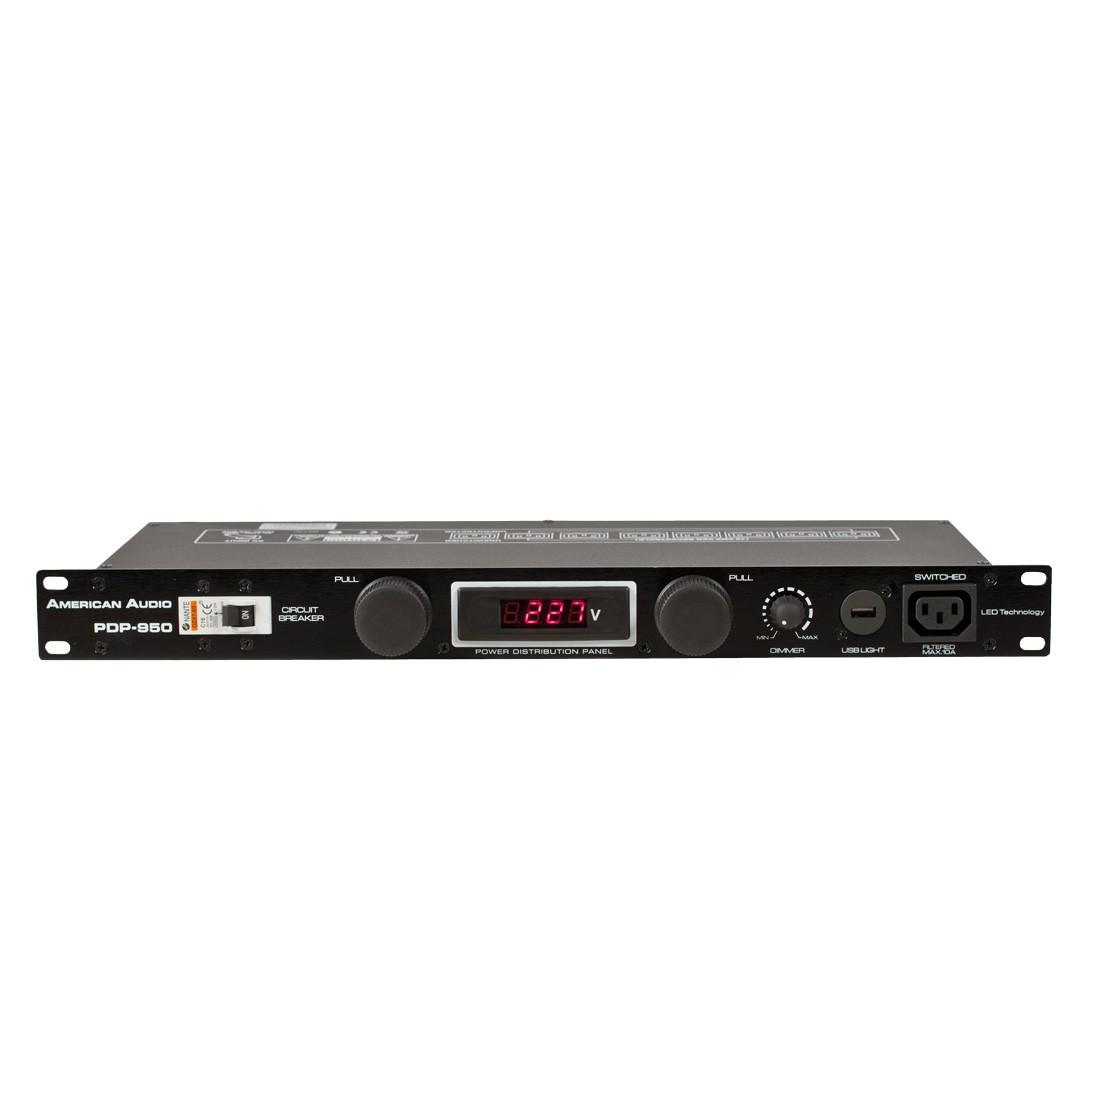 American Audio PDP-950 Power Distribution Panel - DJDeals.com